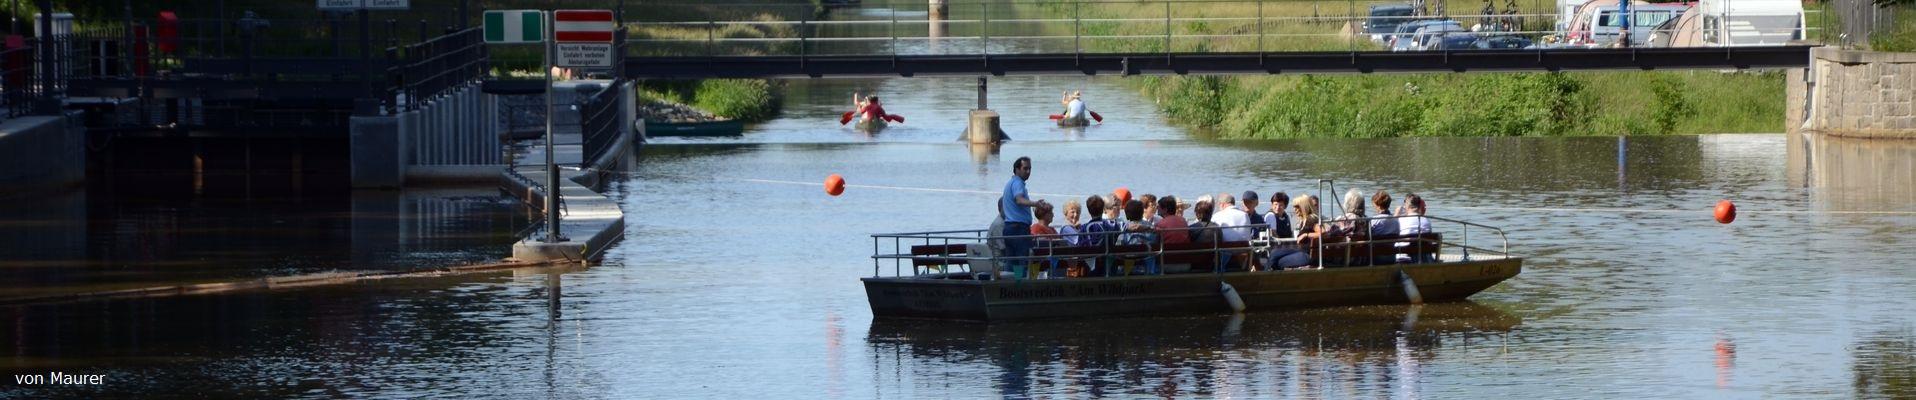 Bootsverleih am Wildpark Motorboottour Slider